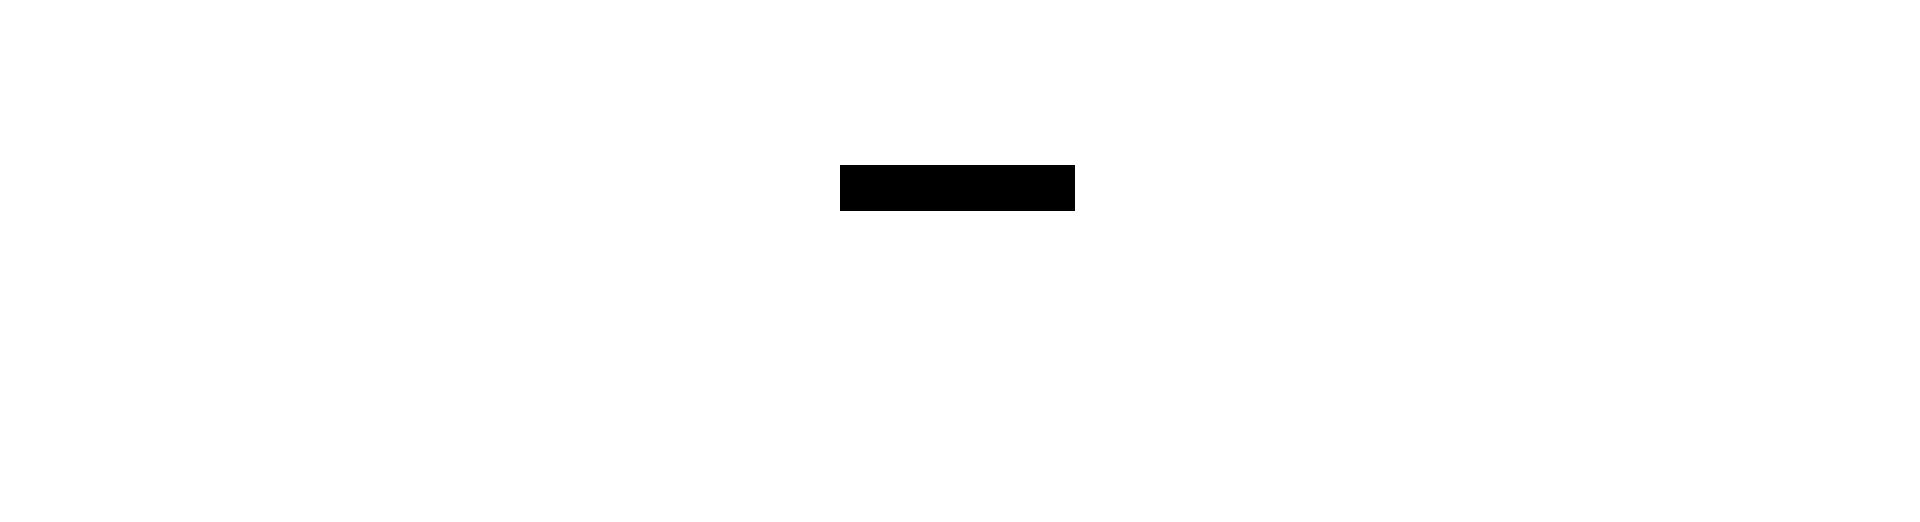 ArkhamRadio-17-bis–copie-6